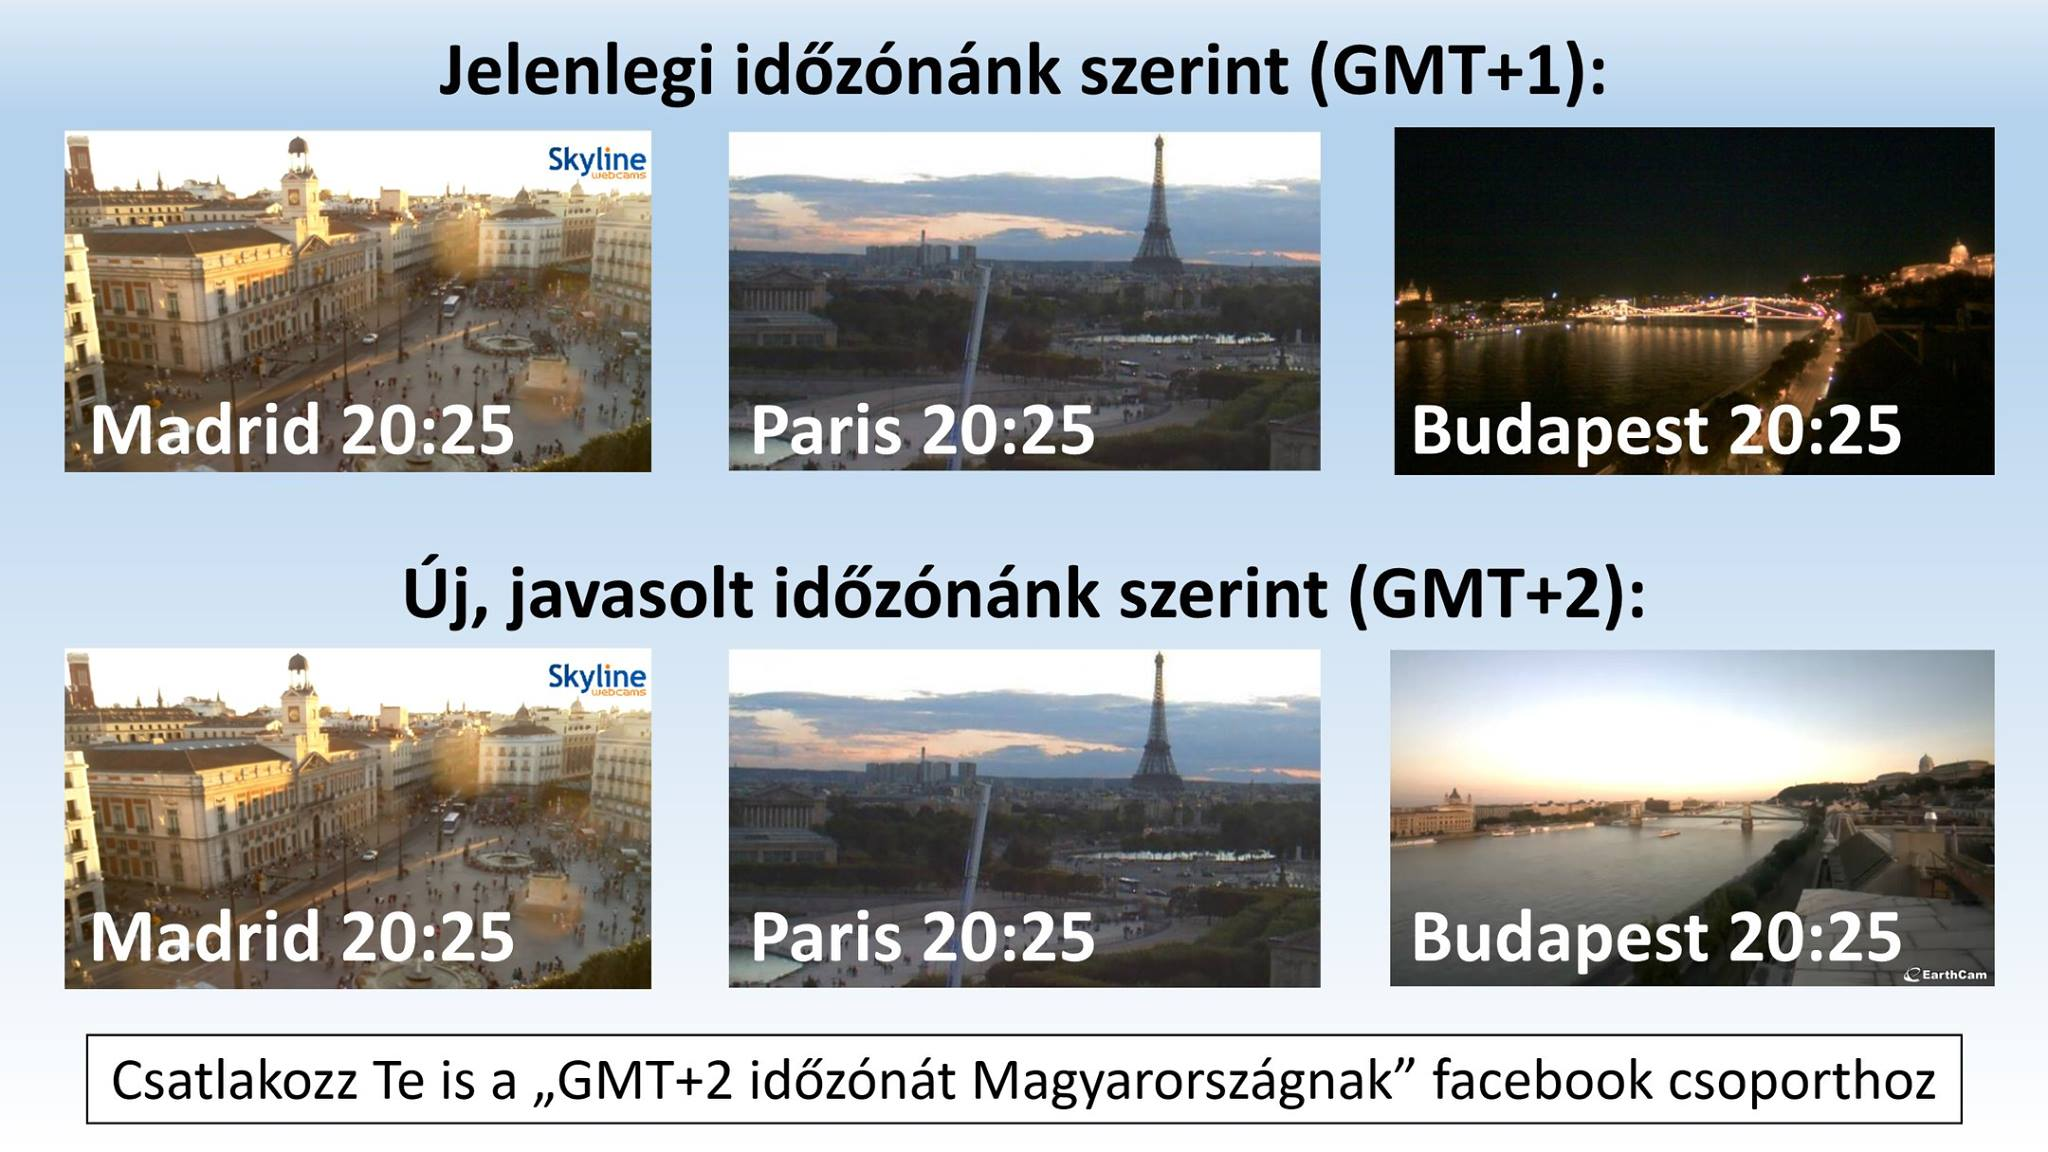 sudy_peter_skyline_montazs.jpg